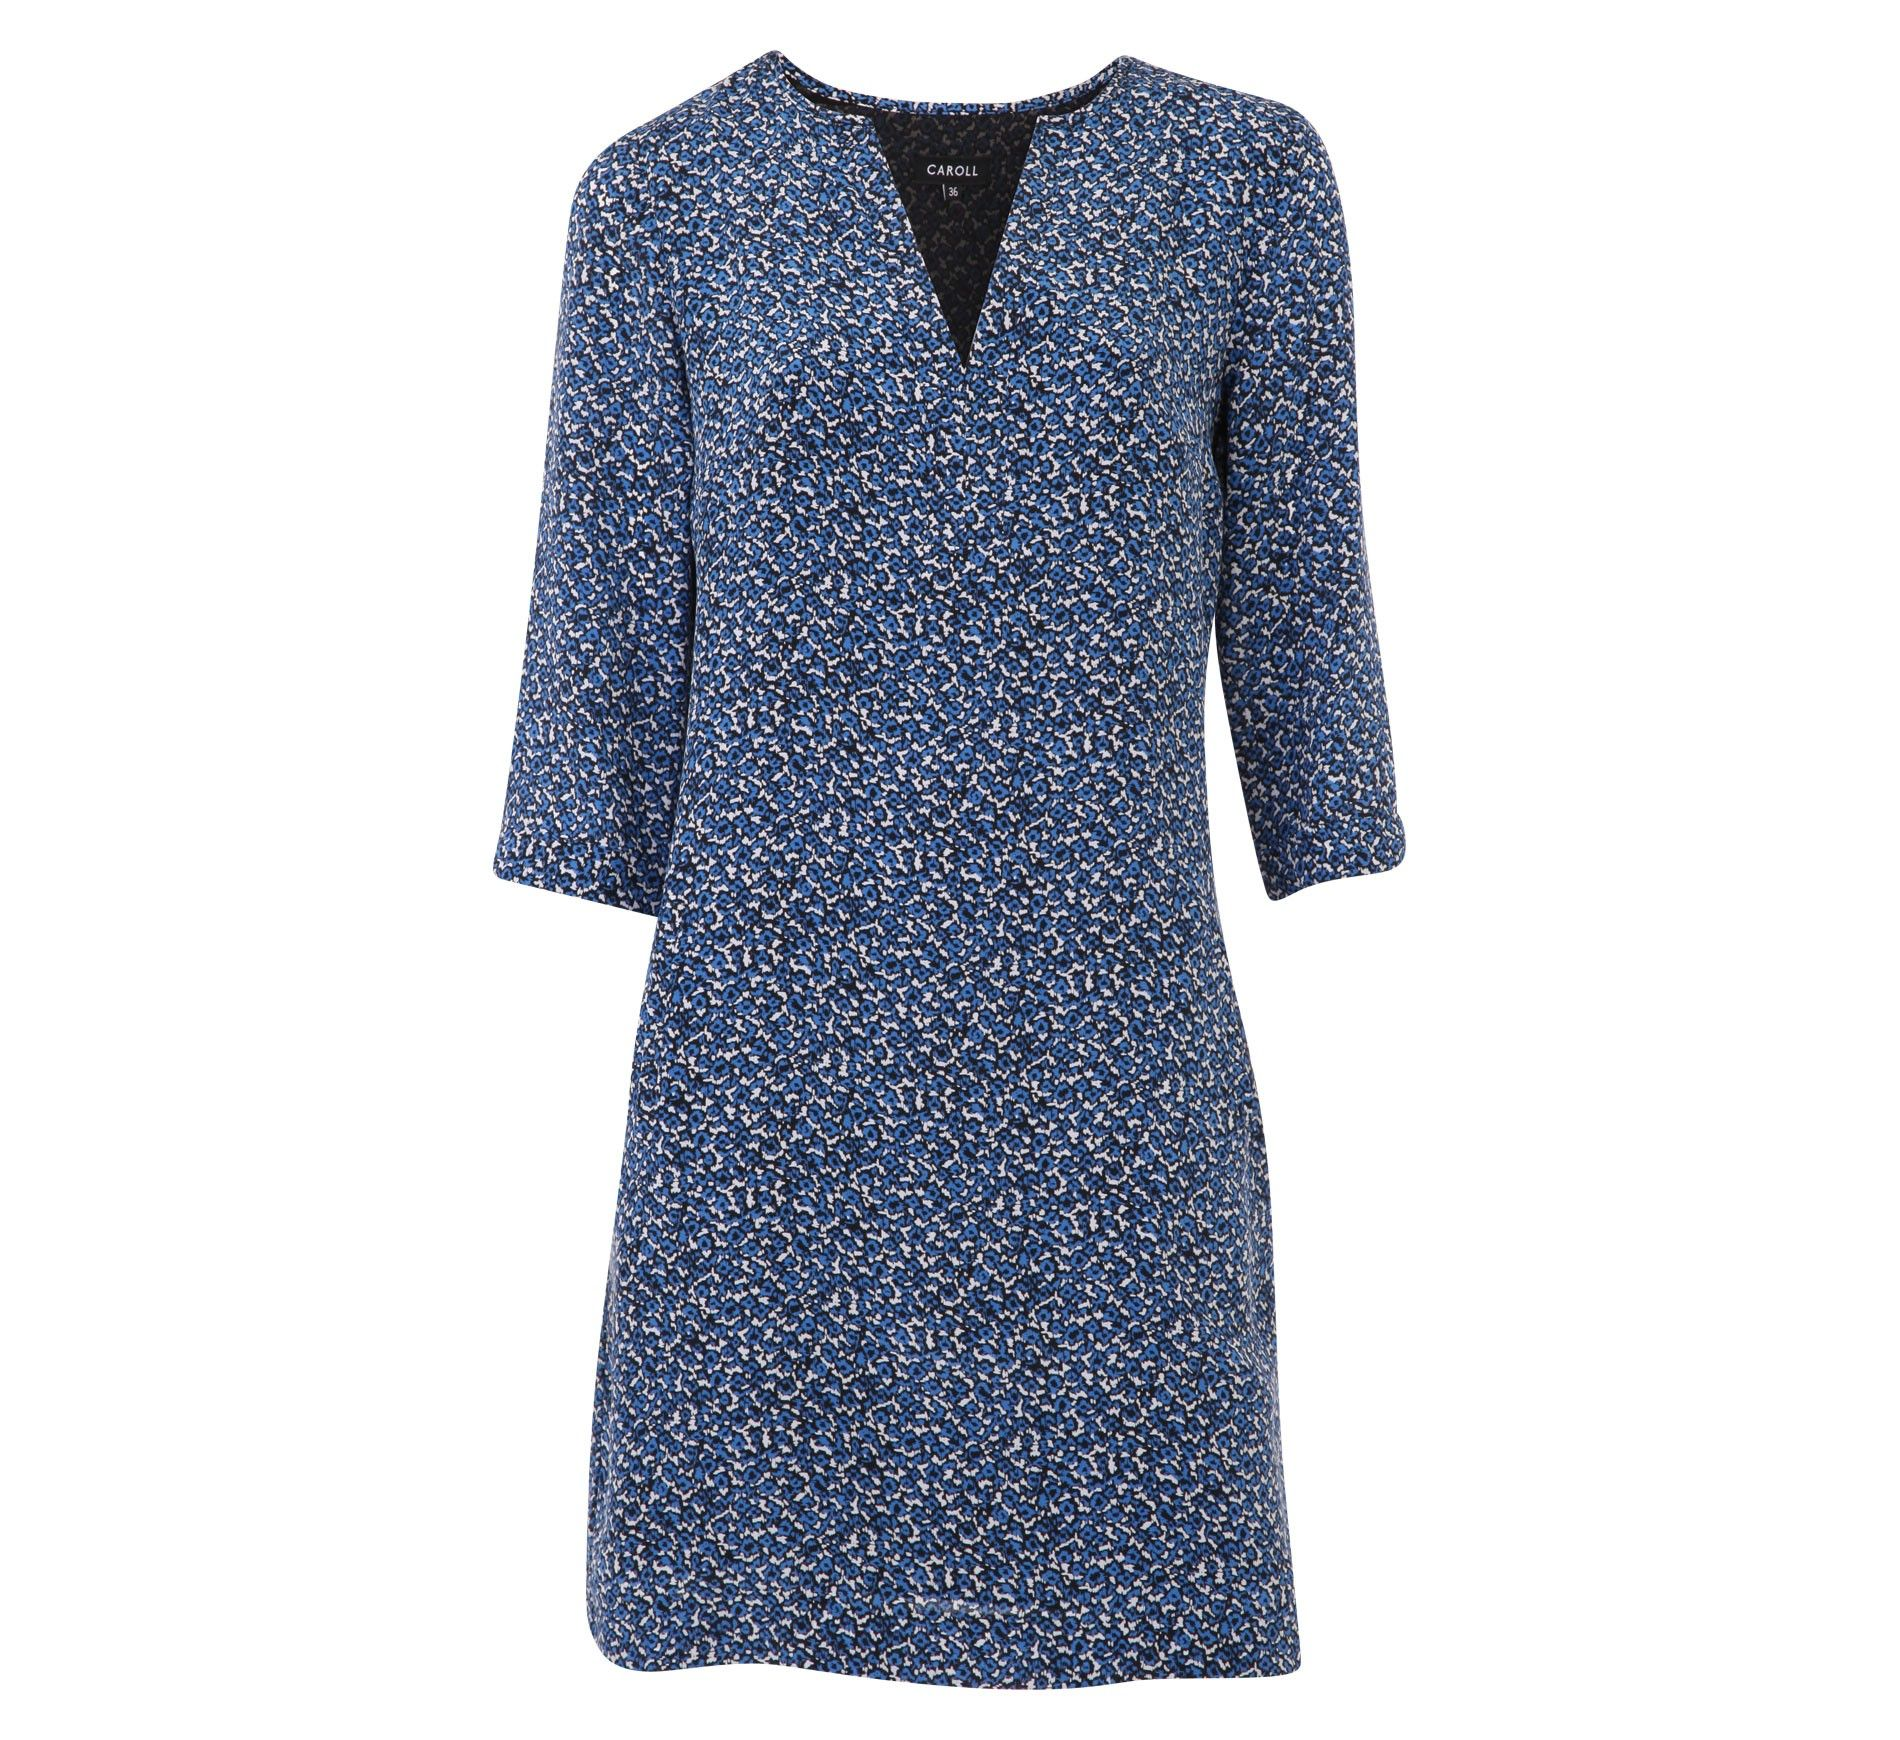 TAILLE 38 Robe Dakota - Robes - E-shopping - Collections